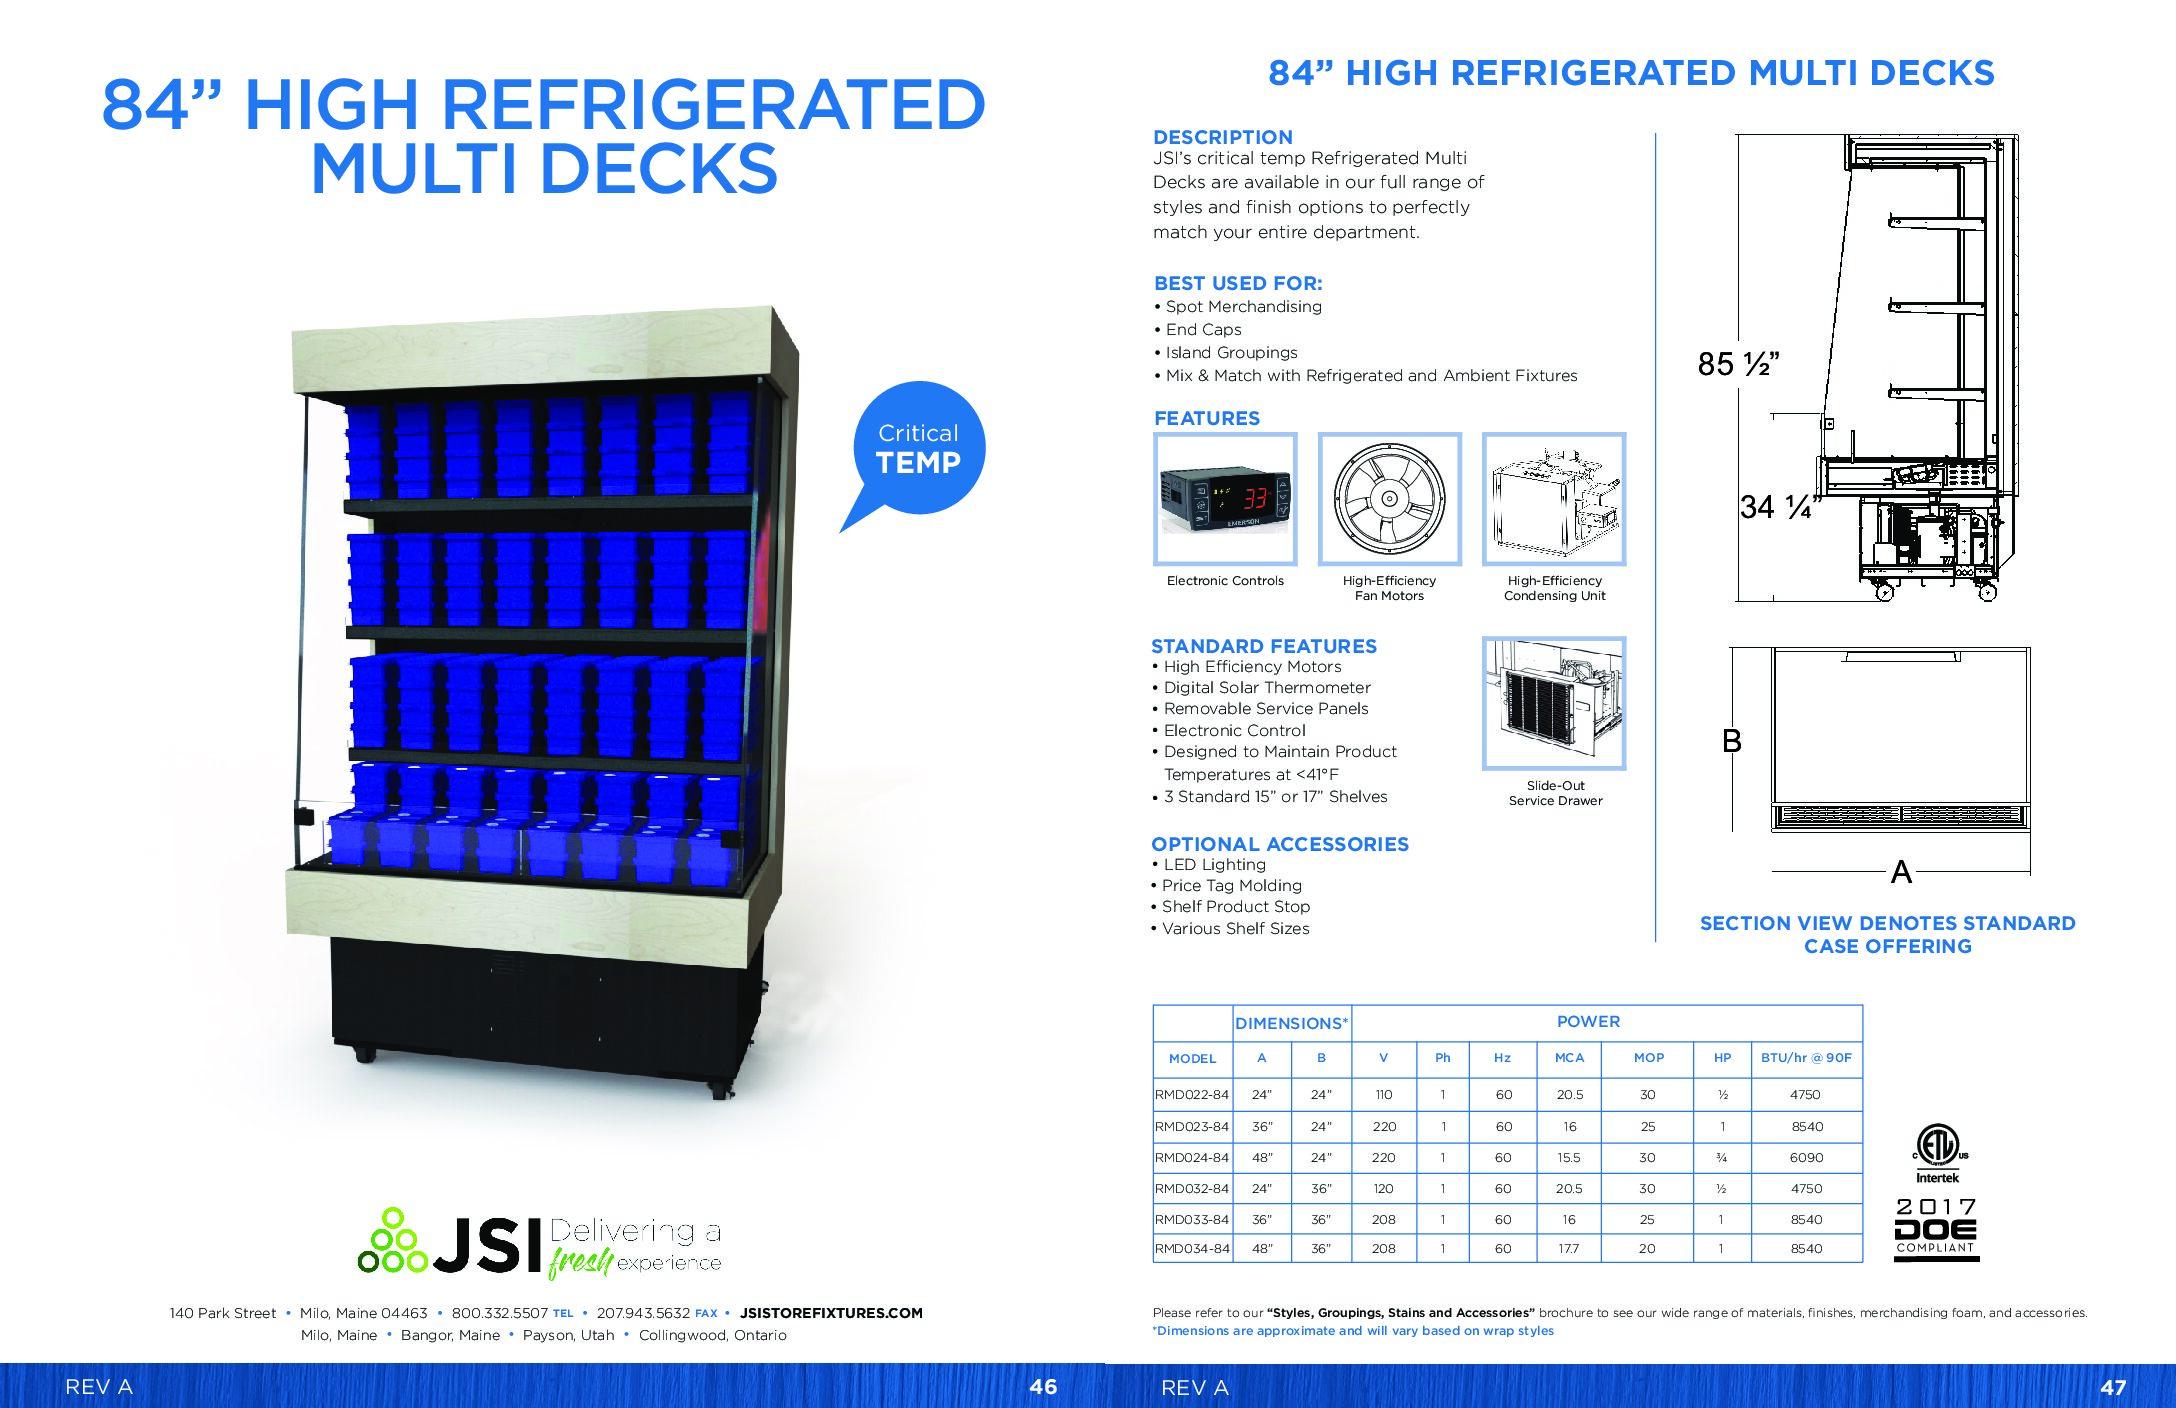 84in High Refrigerated Multi Decks (PDF)